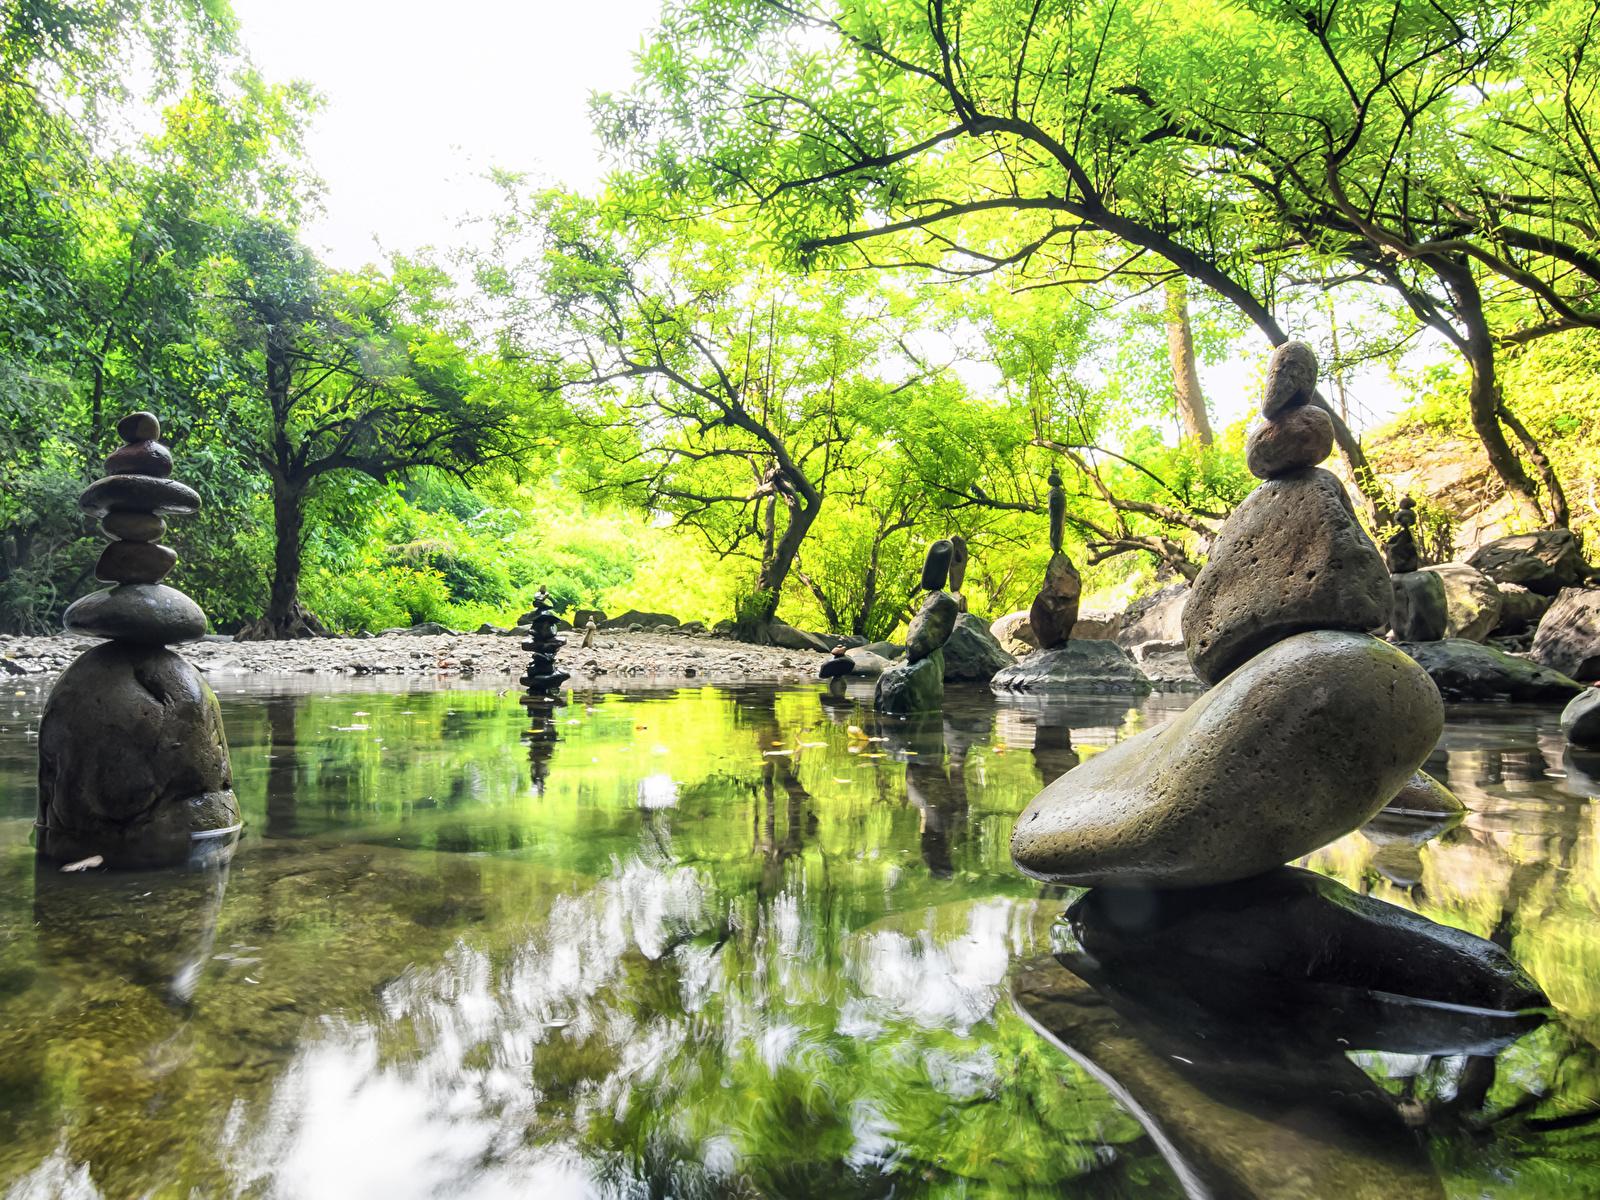 Картинка Природа весенние Пруд Парки Камни скульптура 1600x1200 Весна парк Камень Скульптуры